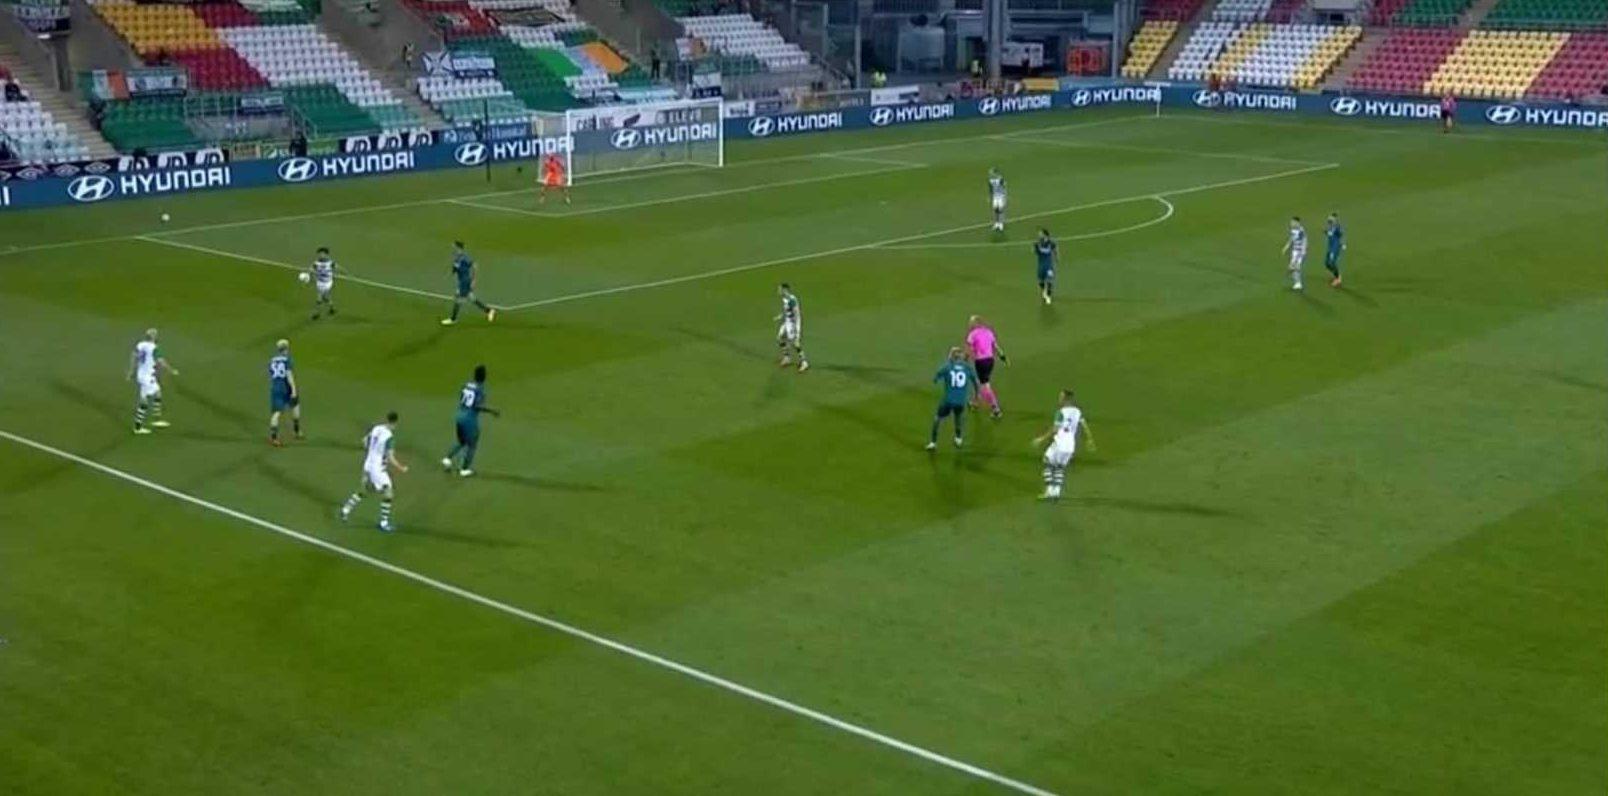 Shamrock Rovers-Milan (0-2): analisi tattica e considerazioni